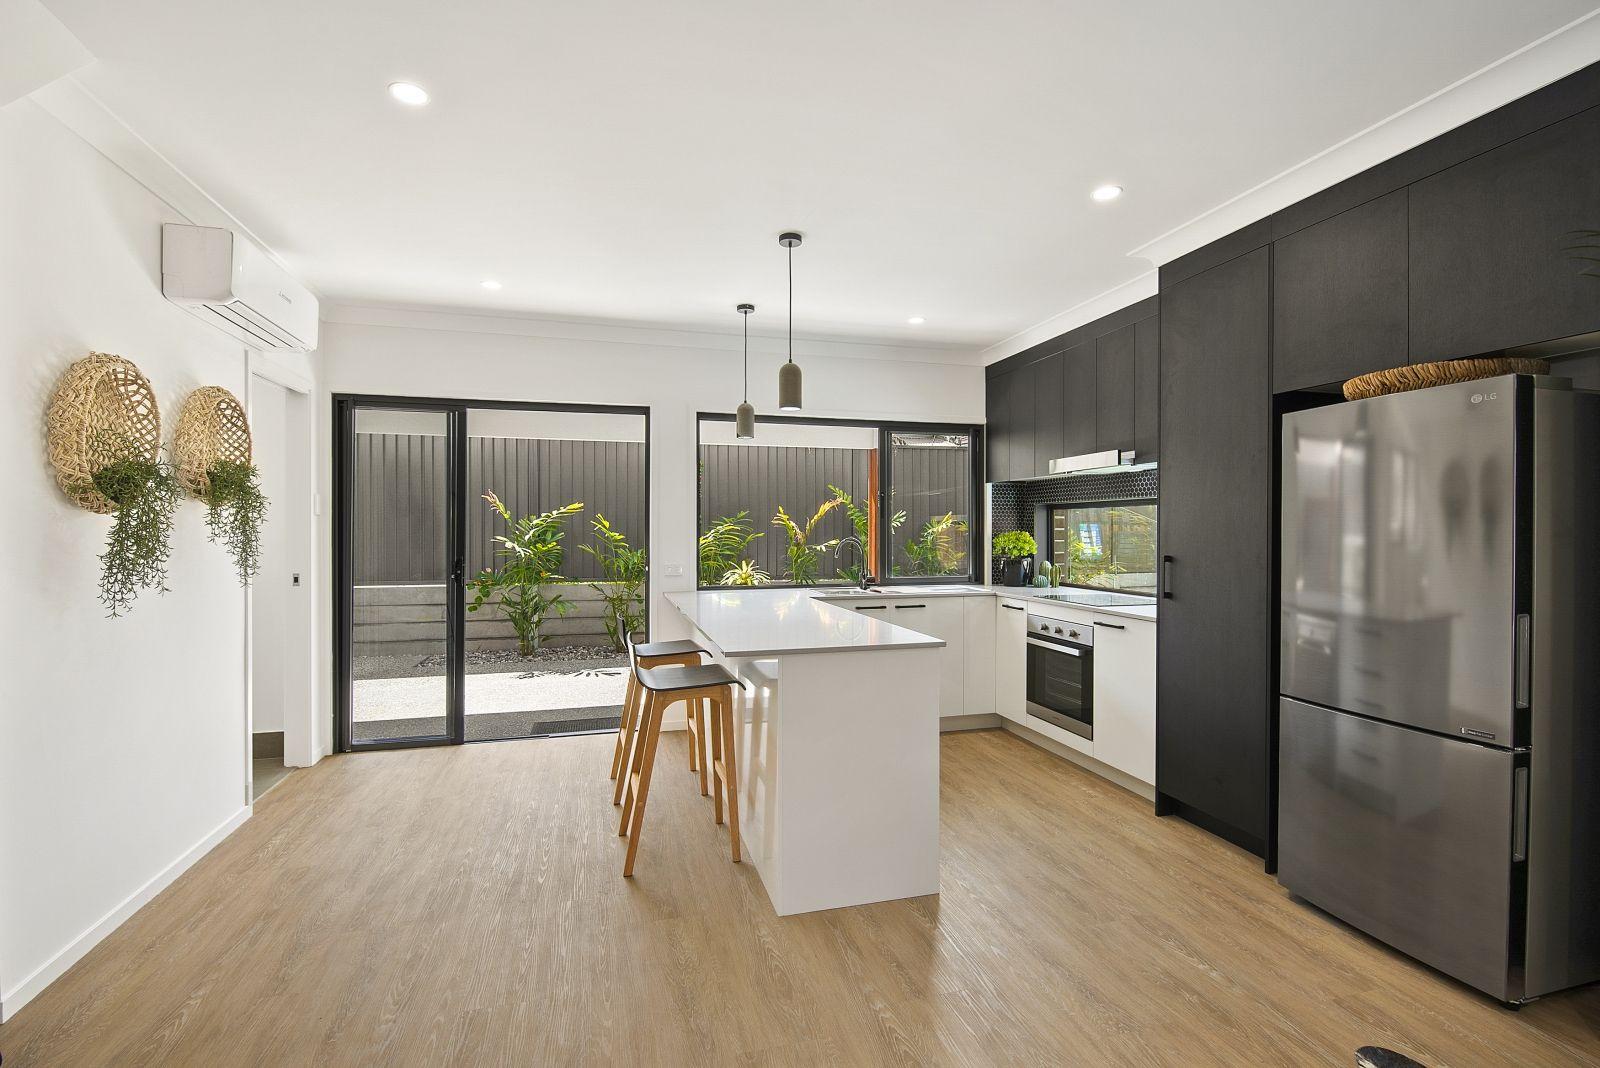 4/32-36 Hardiman Street, Woody Point QLD 4019, Image 0